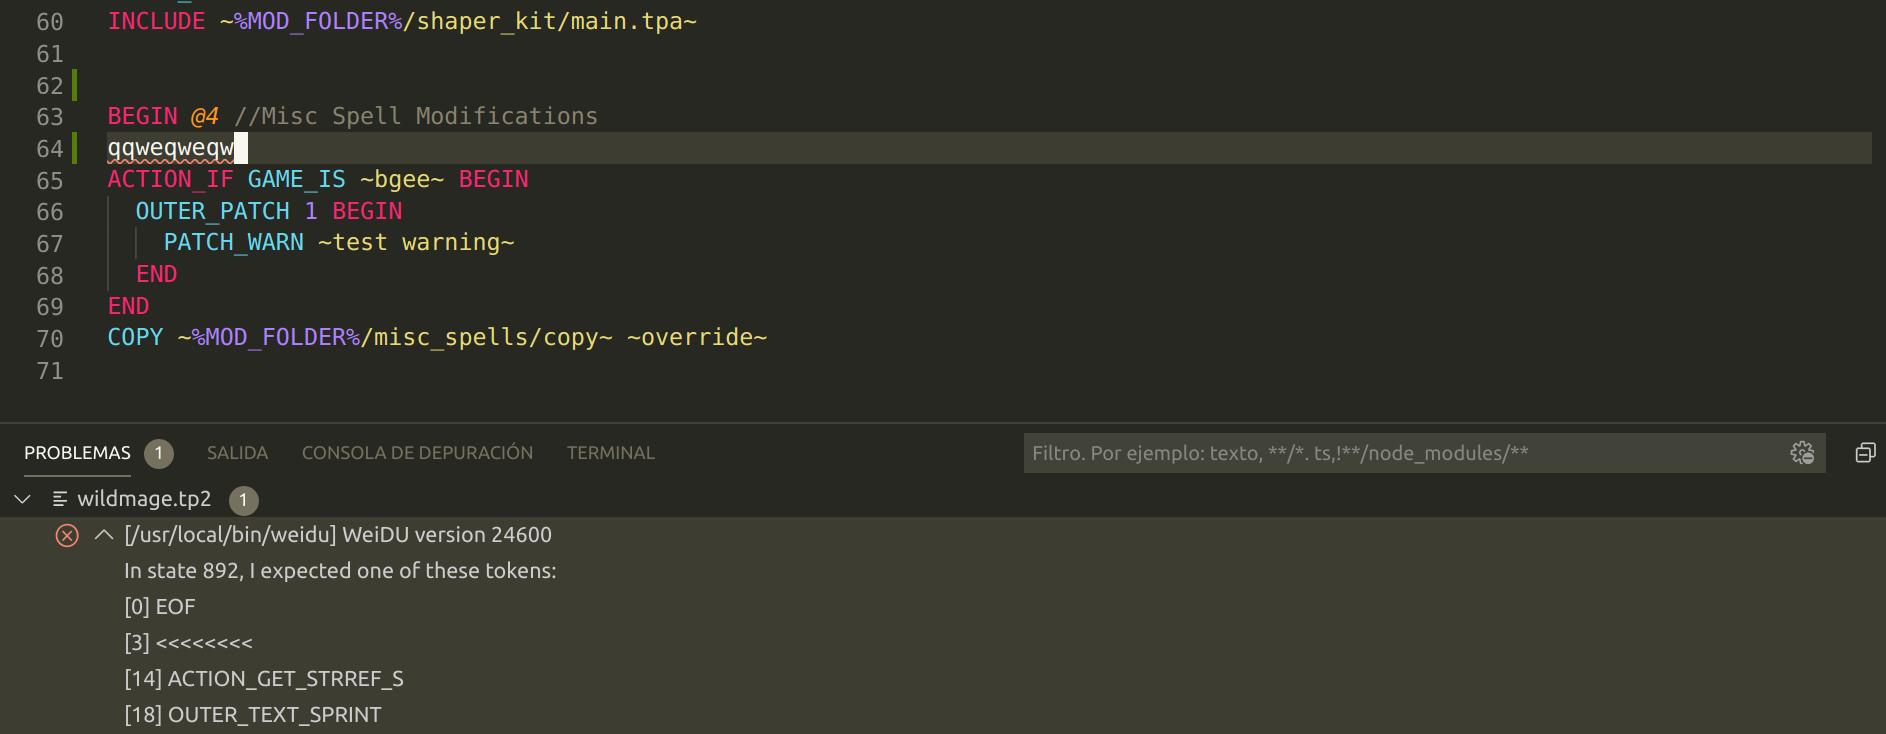 error reporting example